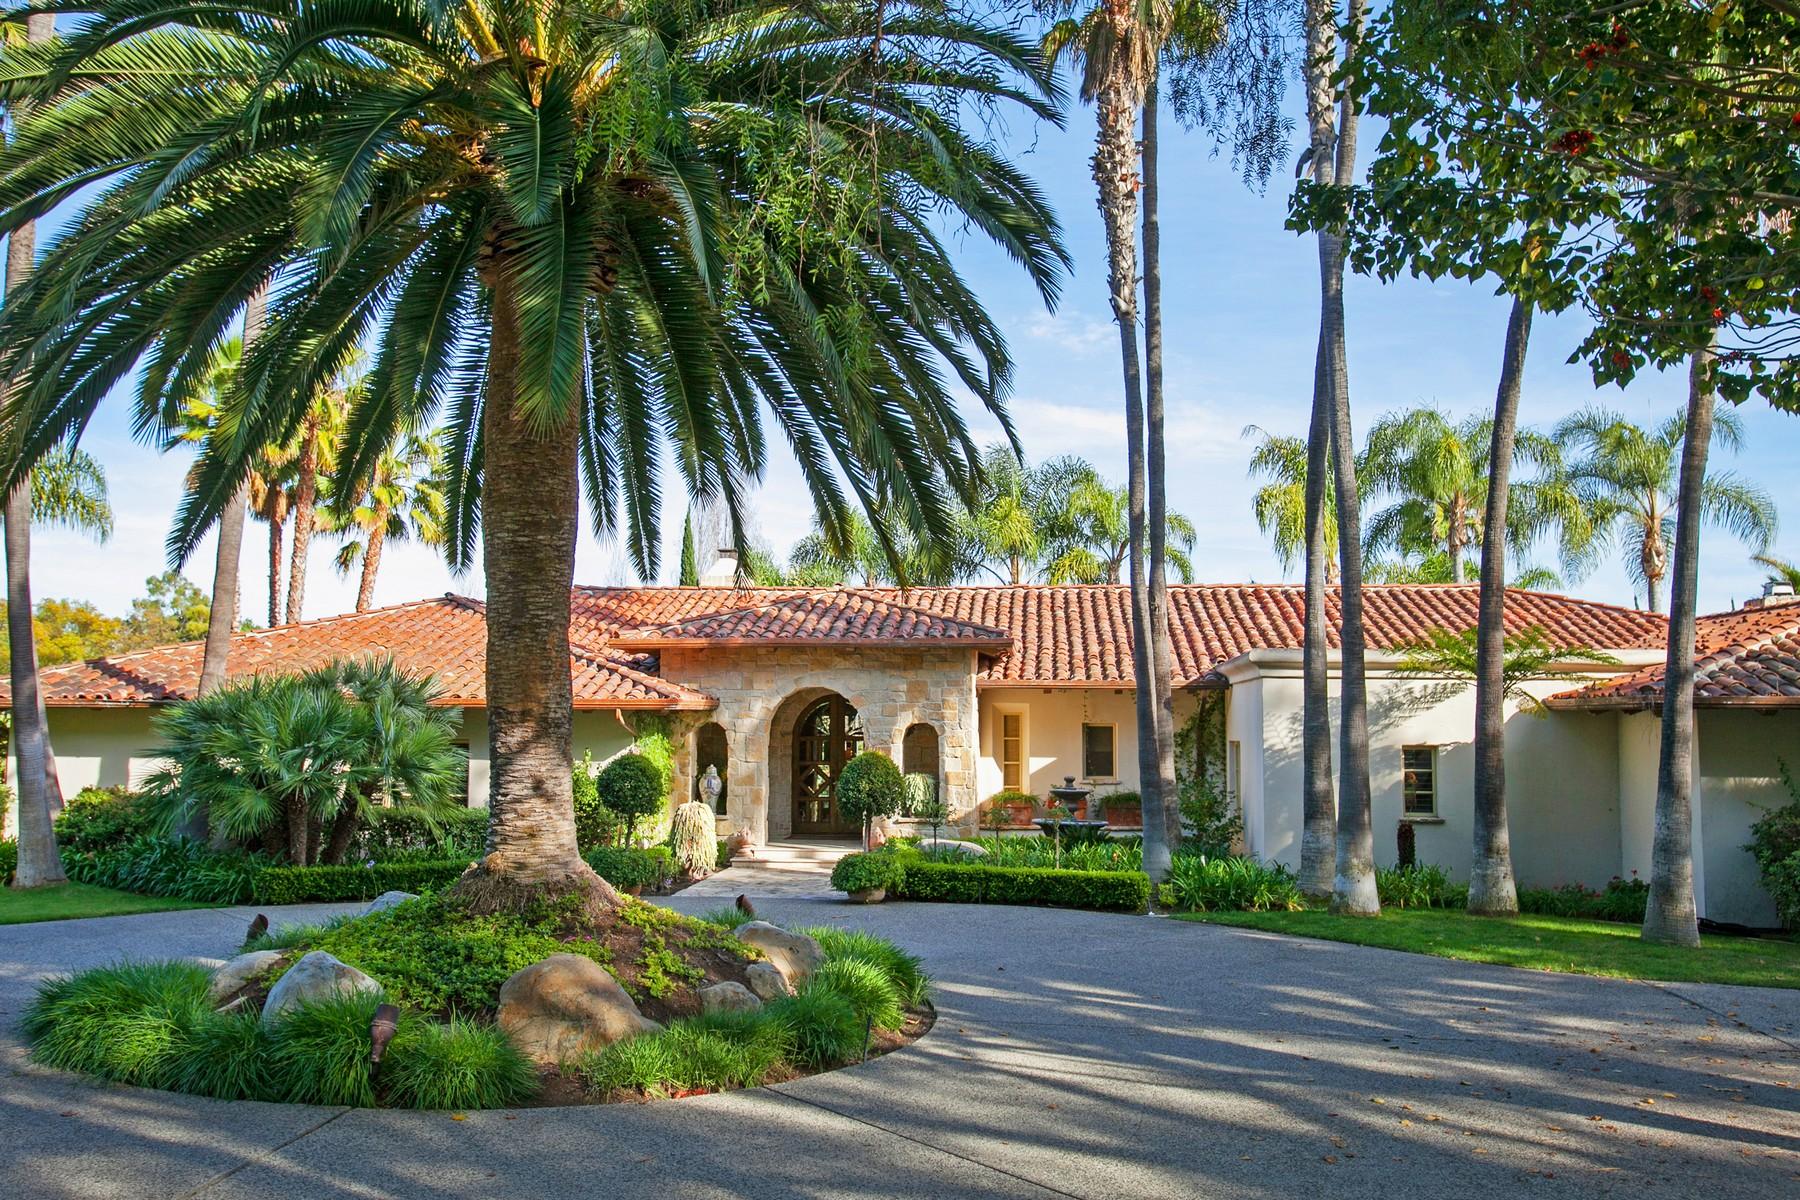 Single Family Home for Sale at 7045 El Vuelo Del Este Rancho Santa Fe, California 92067 United States